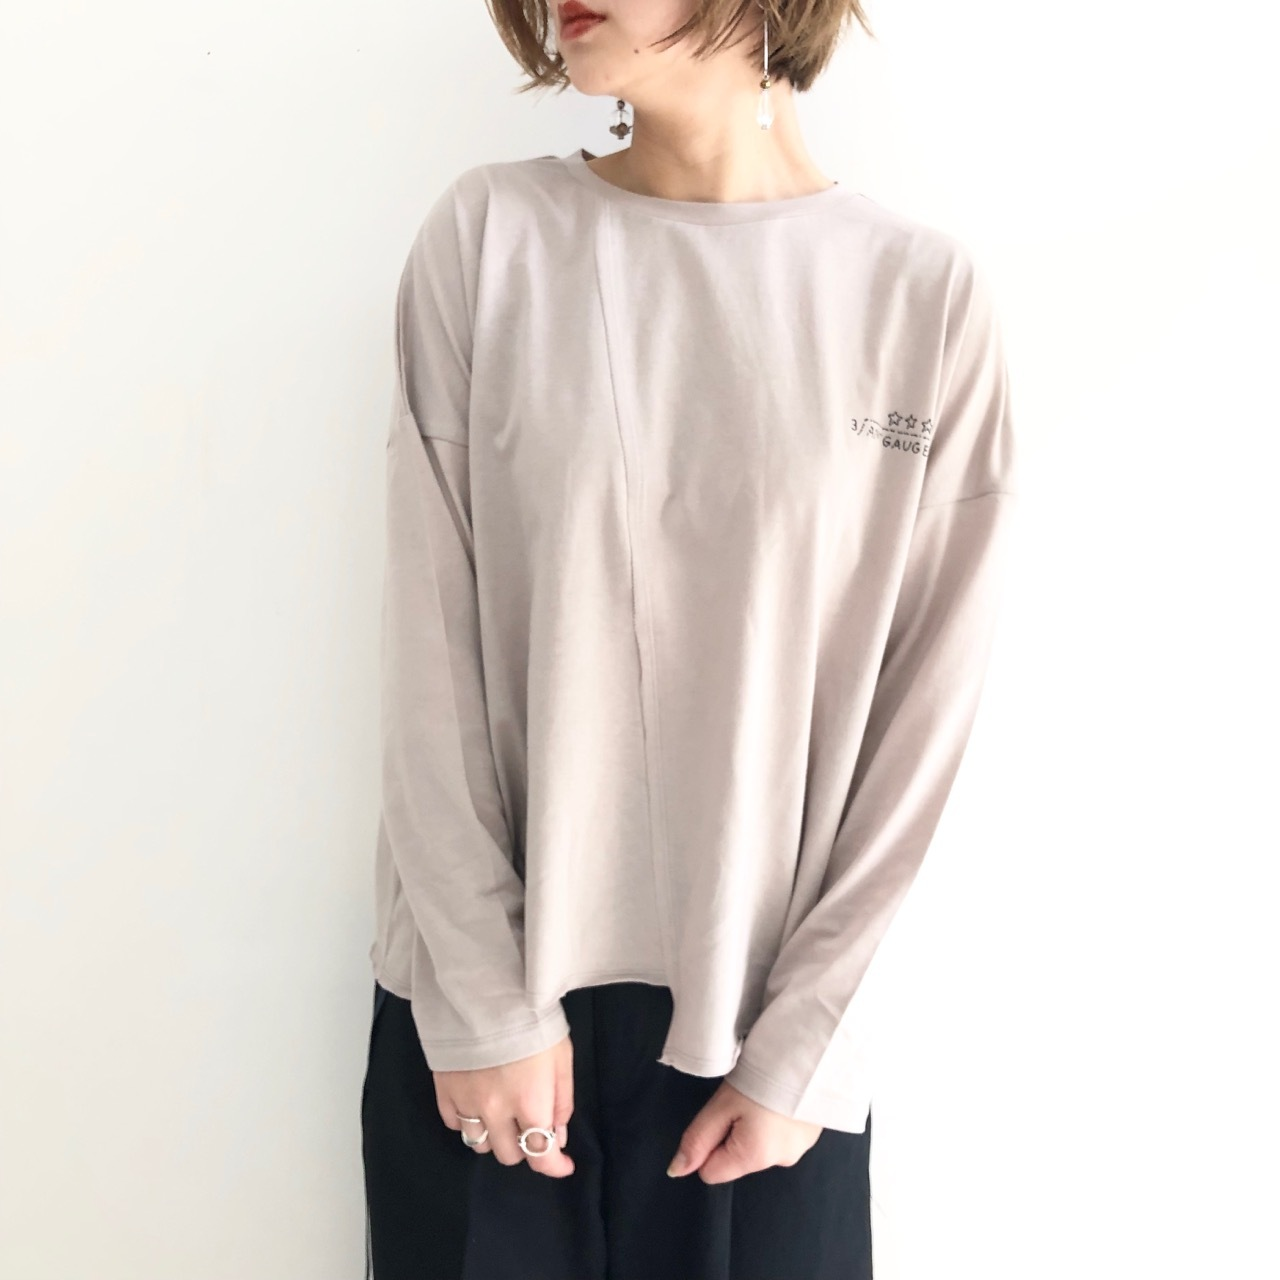 【 ANTGAUGE 】- AB837 - ロングスリーブプリントTeeシャツ